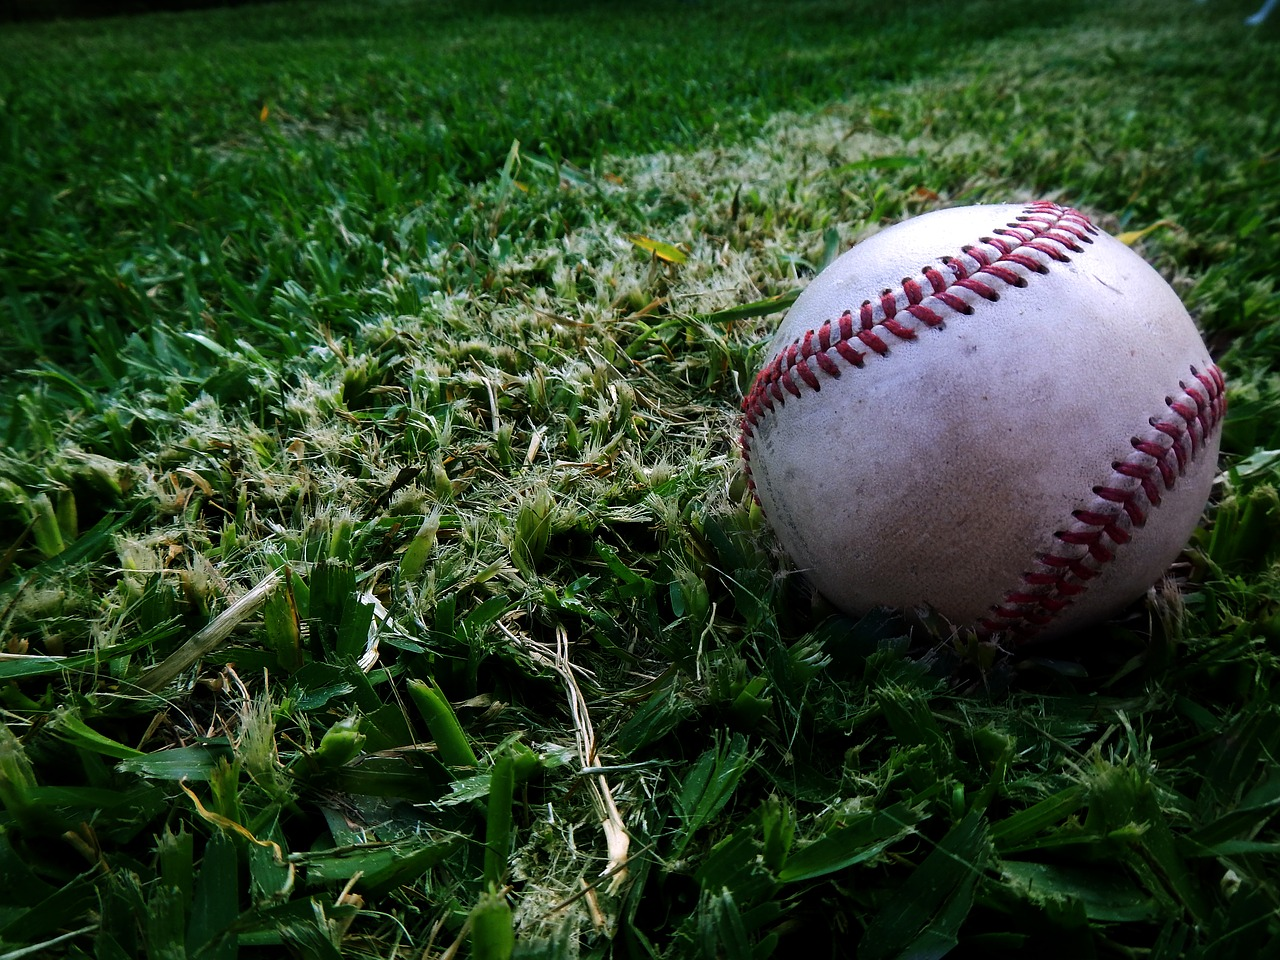 Rice baseball, Conference USA